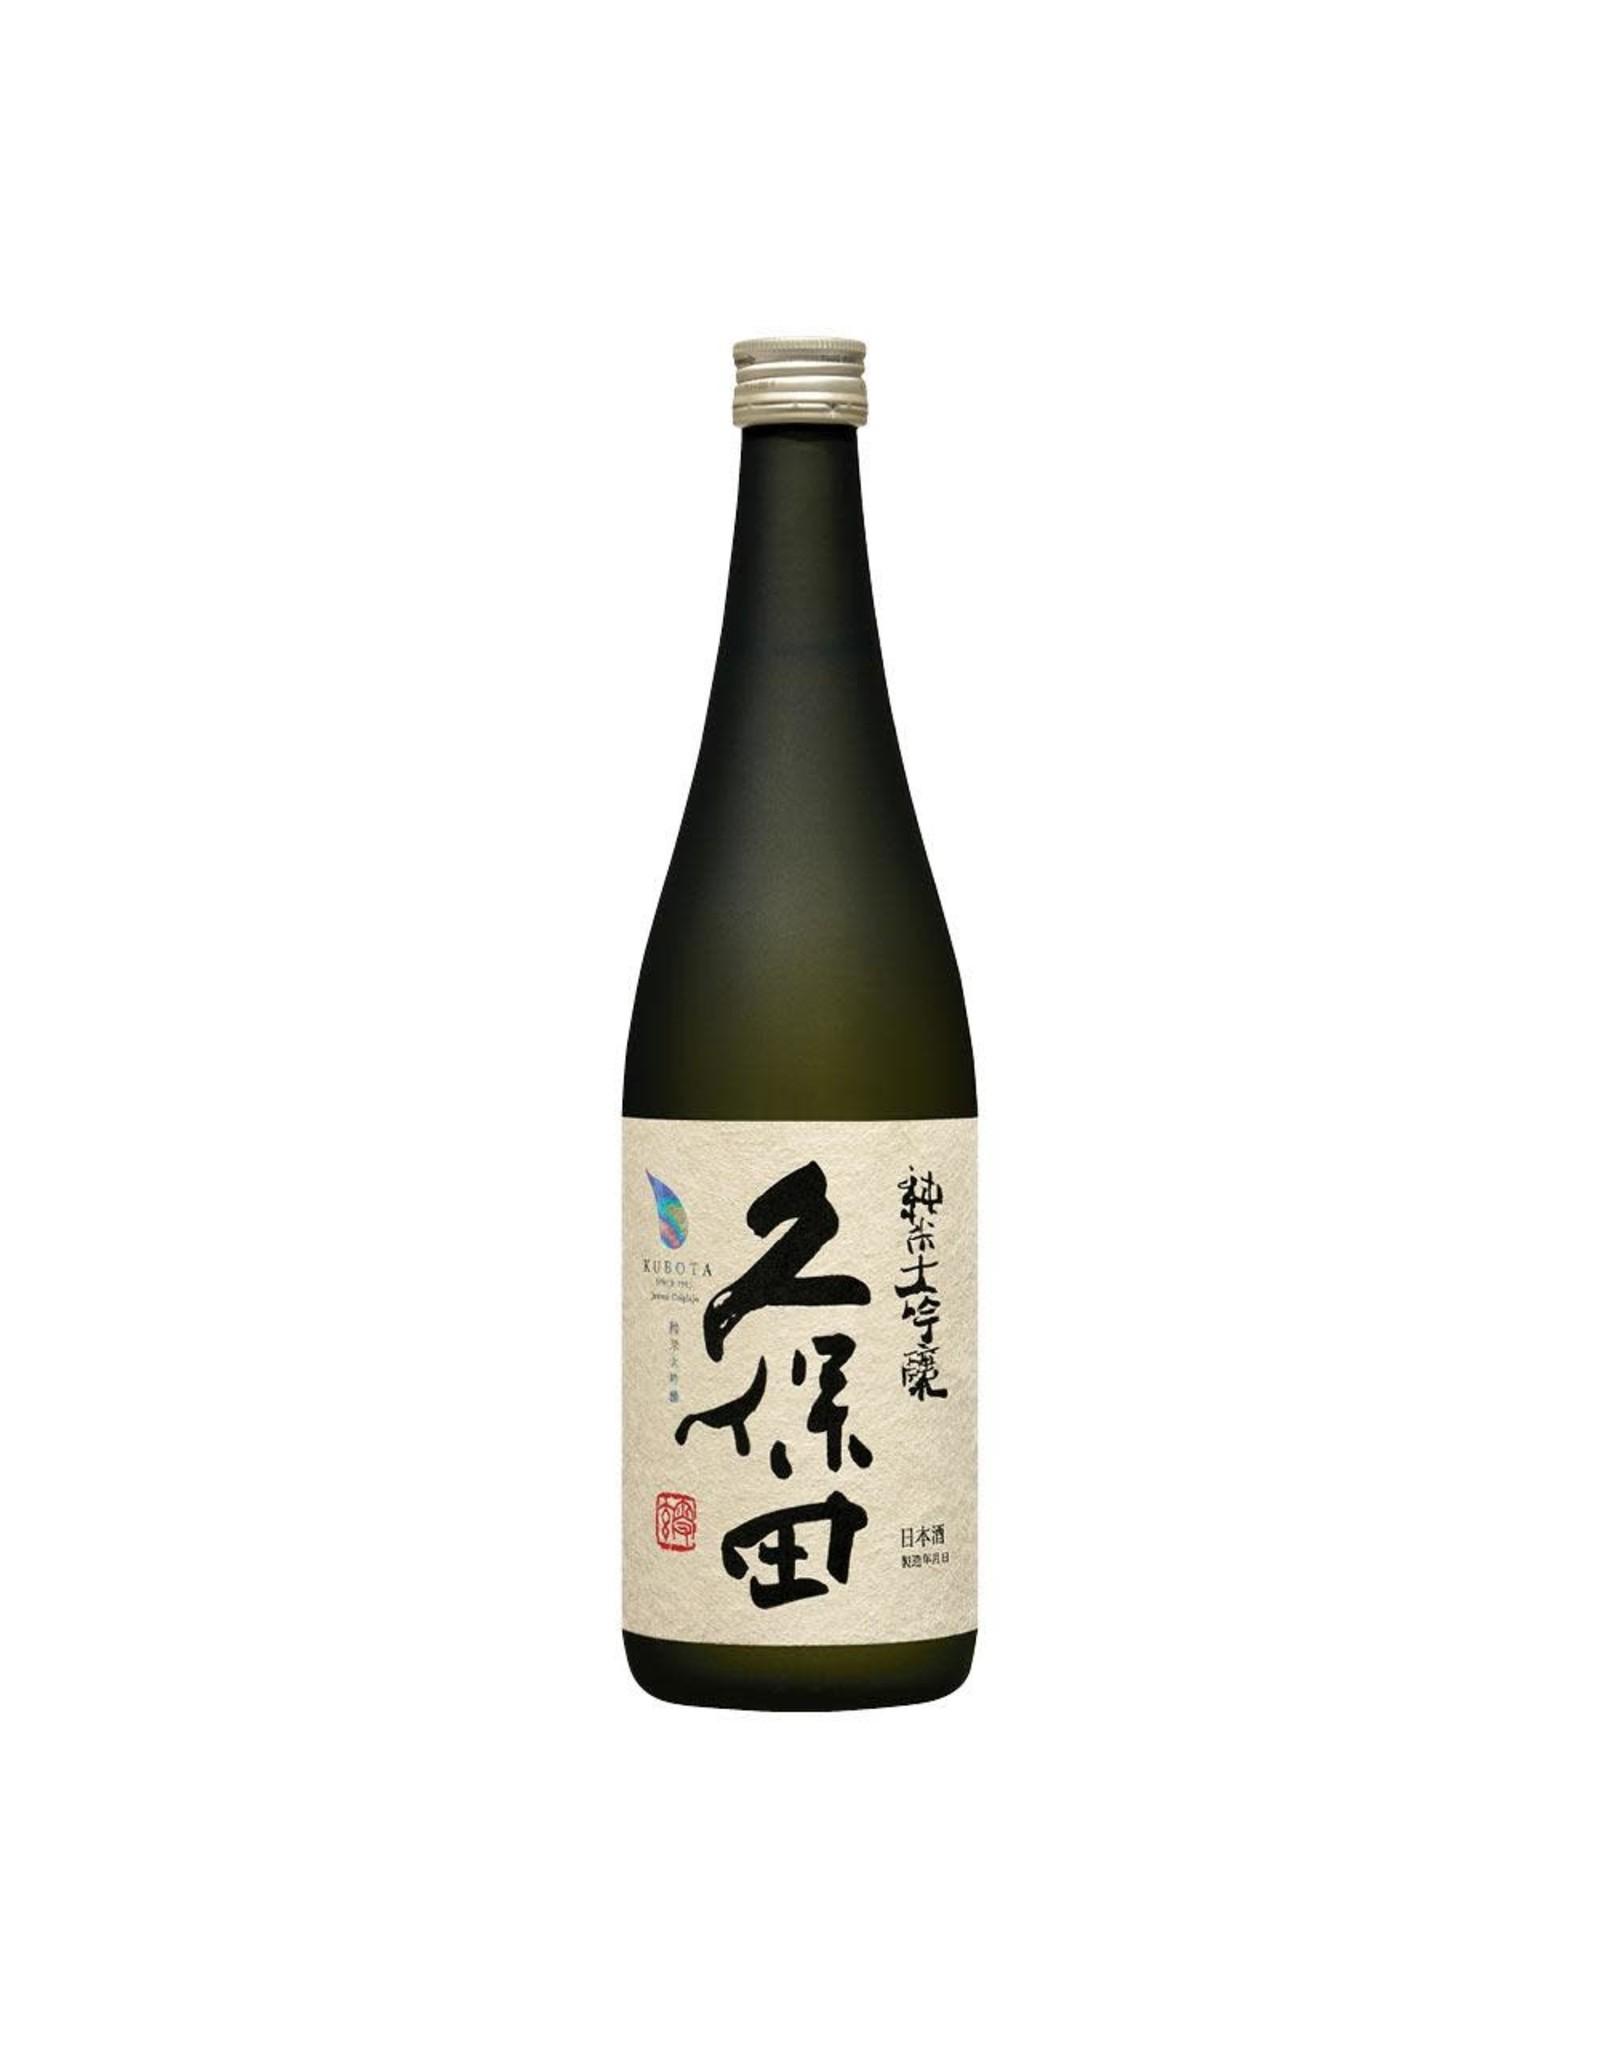 Japan Kubota Junmai Daiginjo 720ml